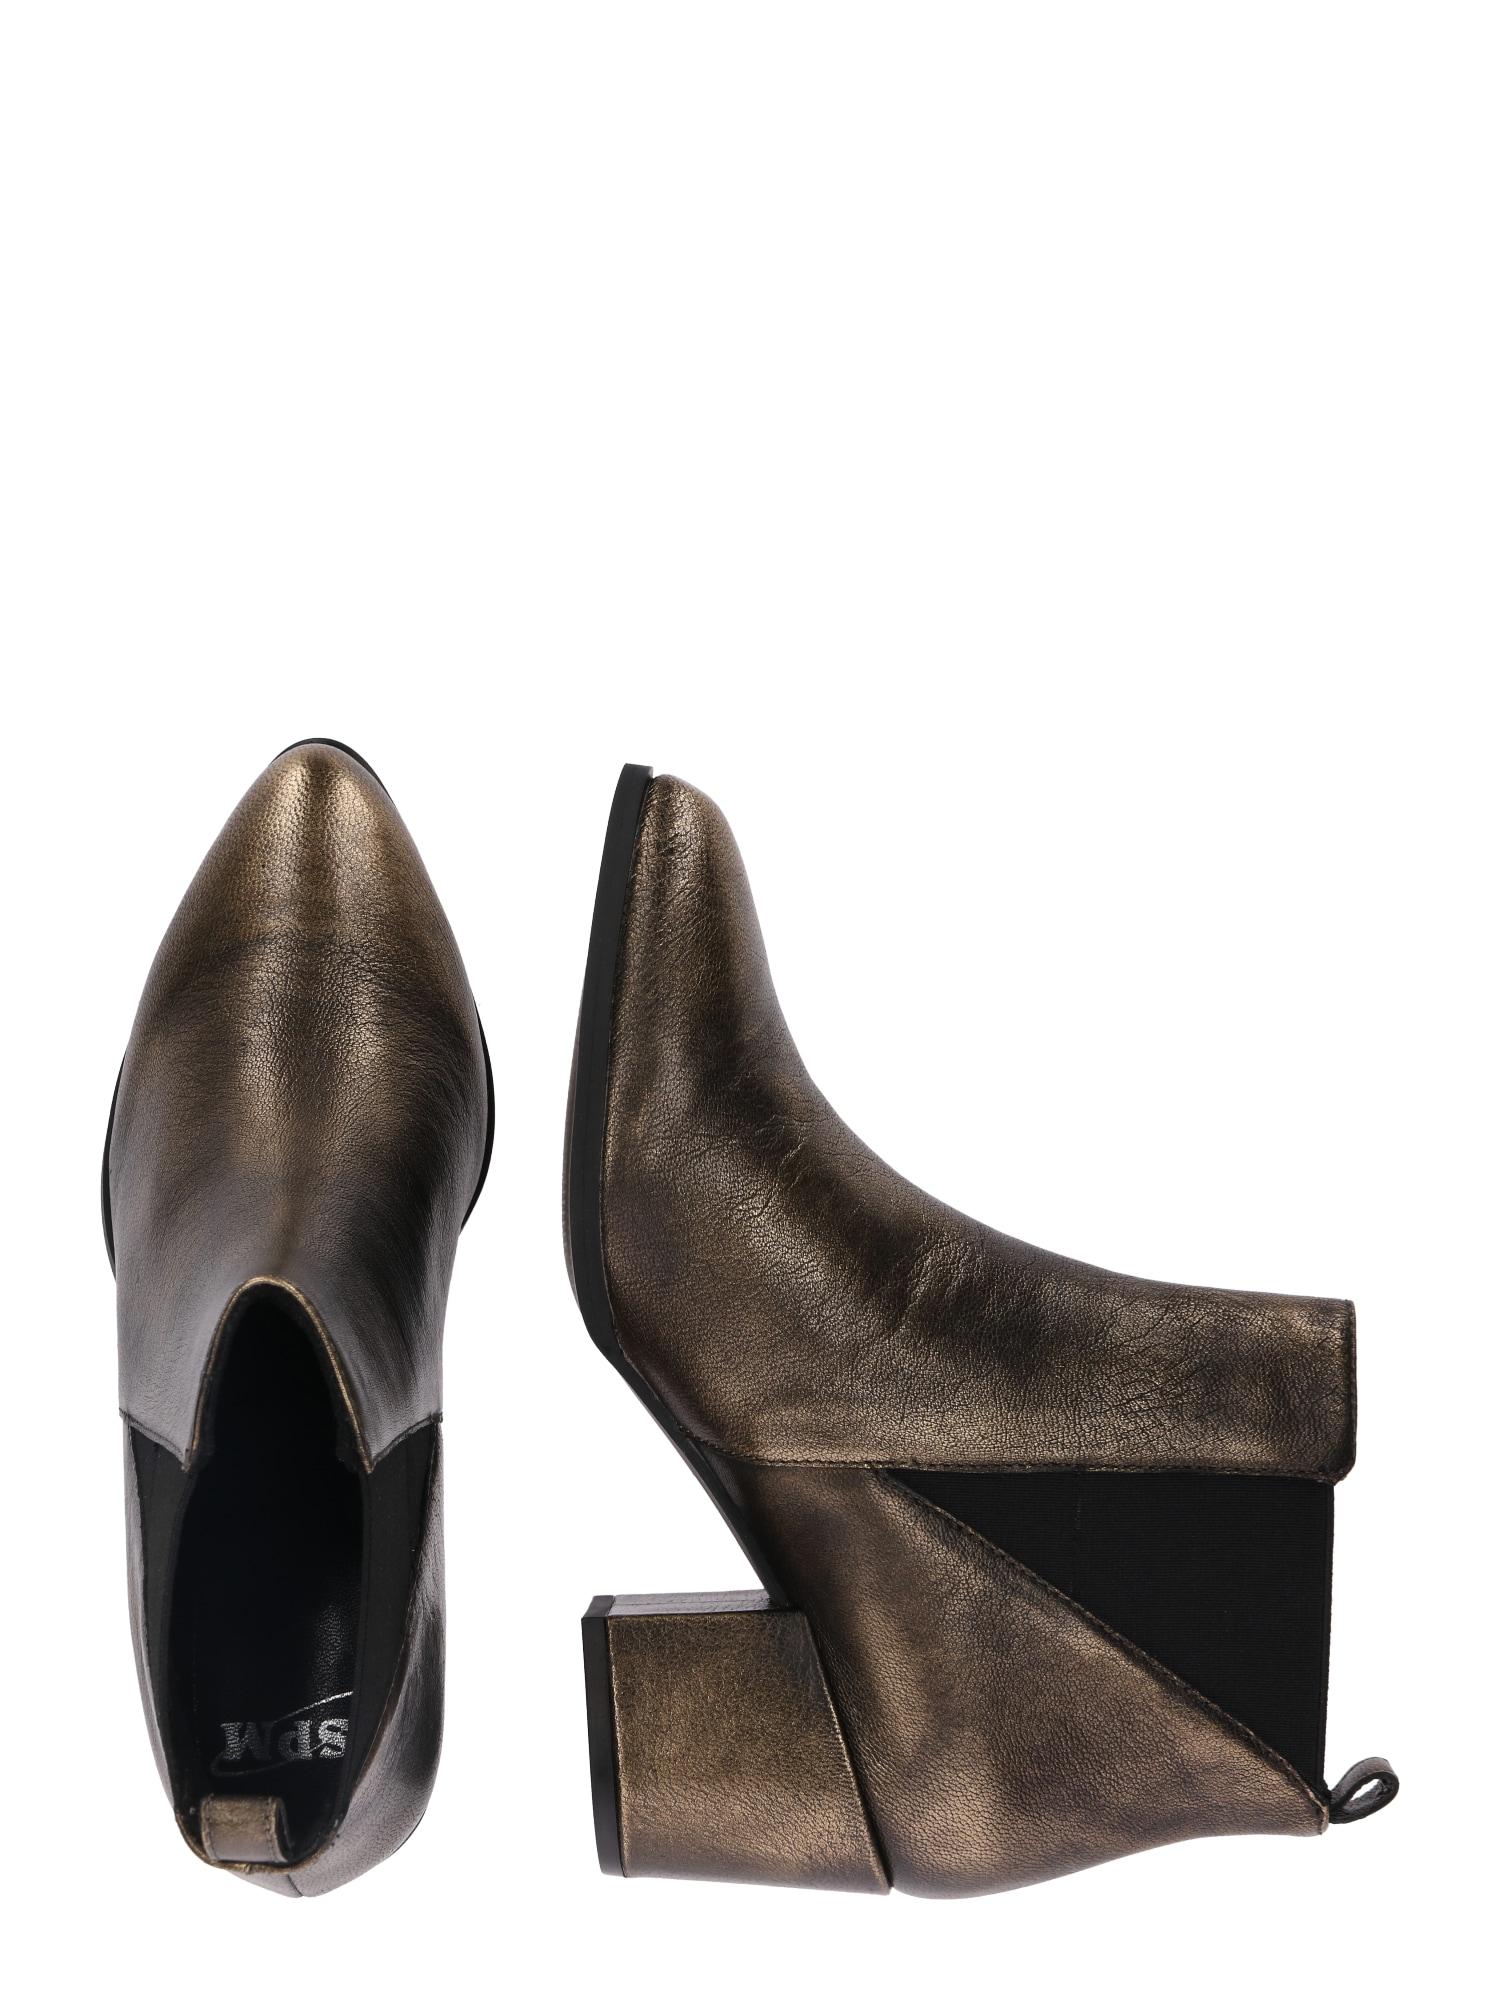 Chelsea boots 'Nelsea'